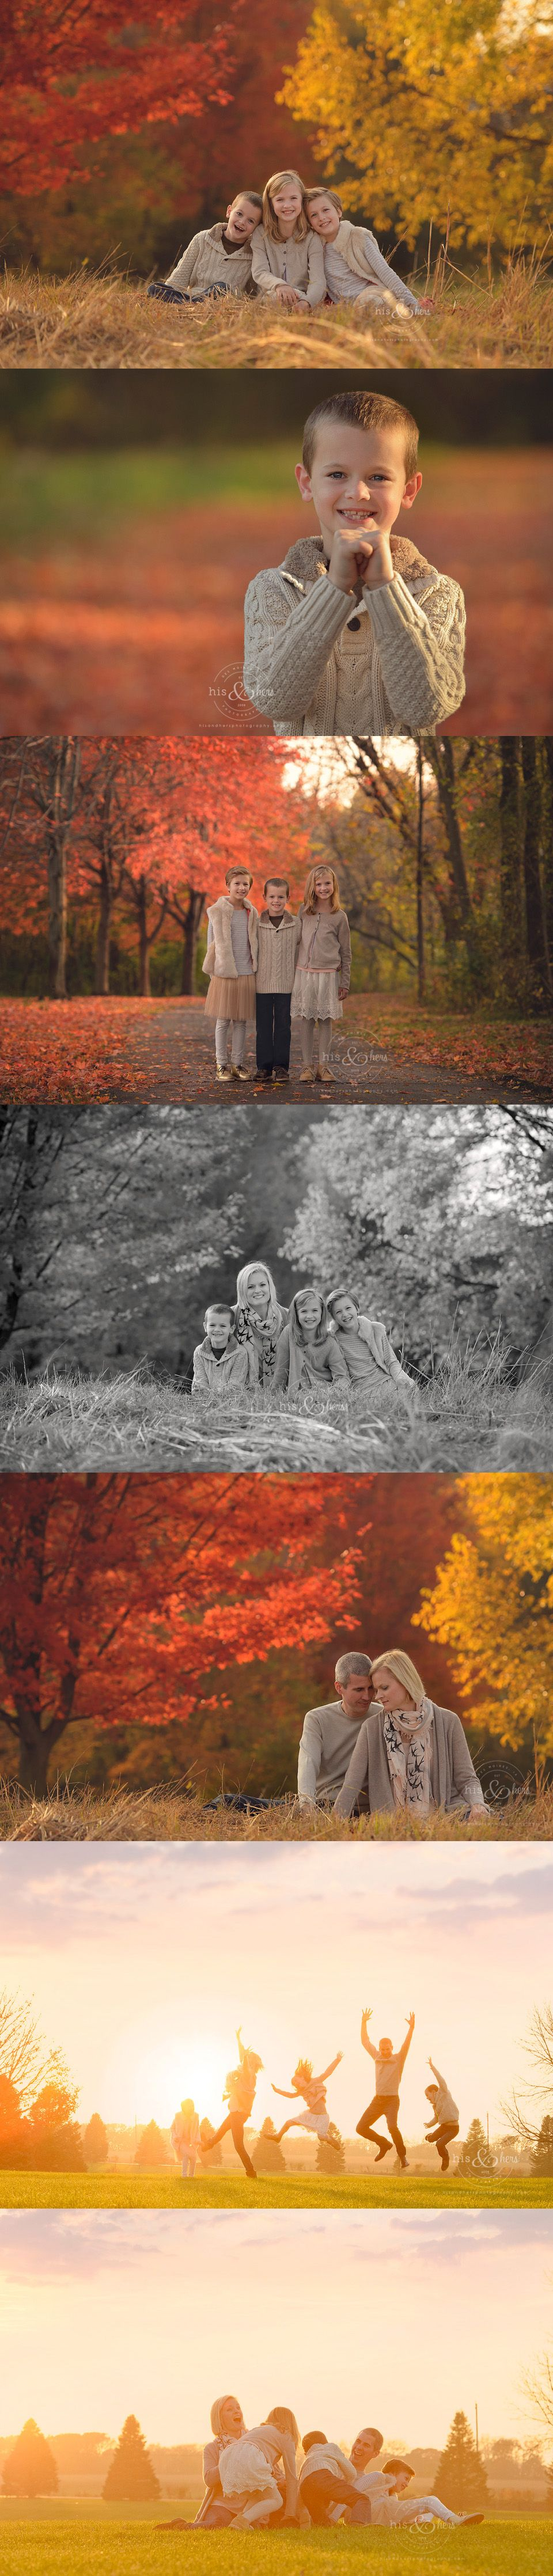 Family | Dave + Sarah + kids